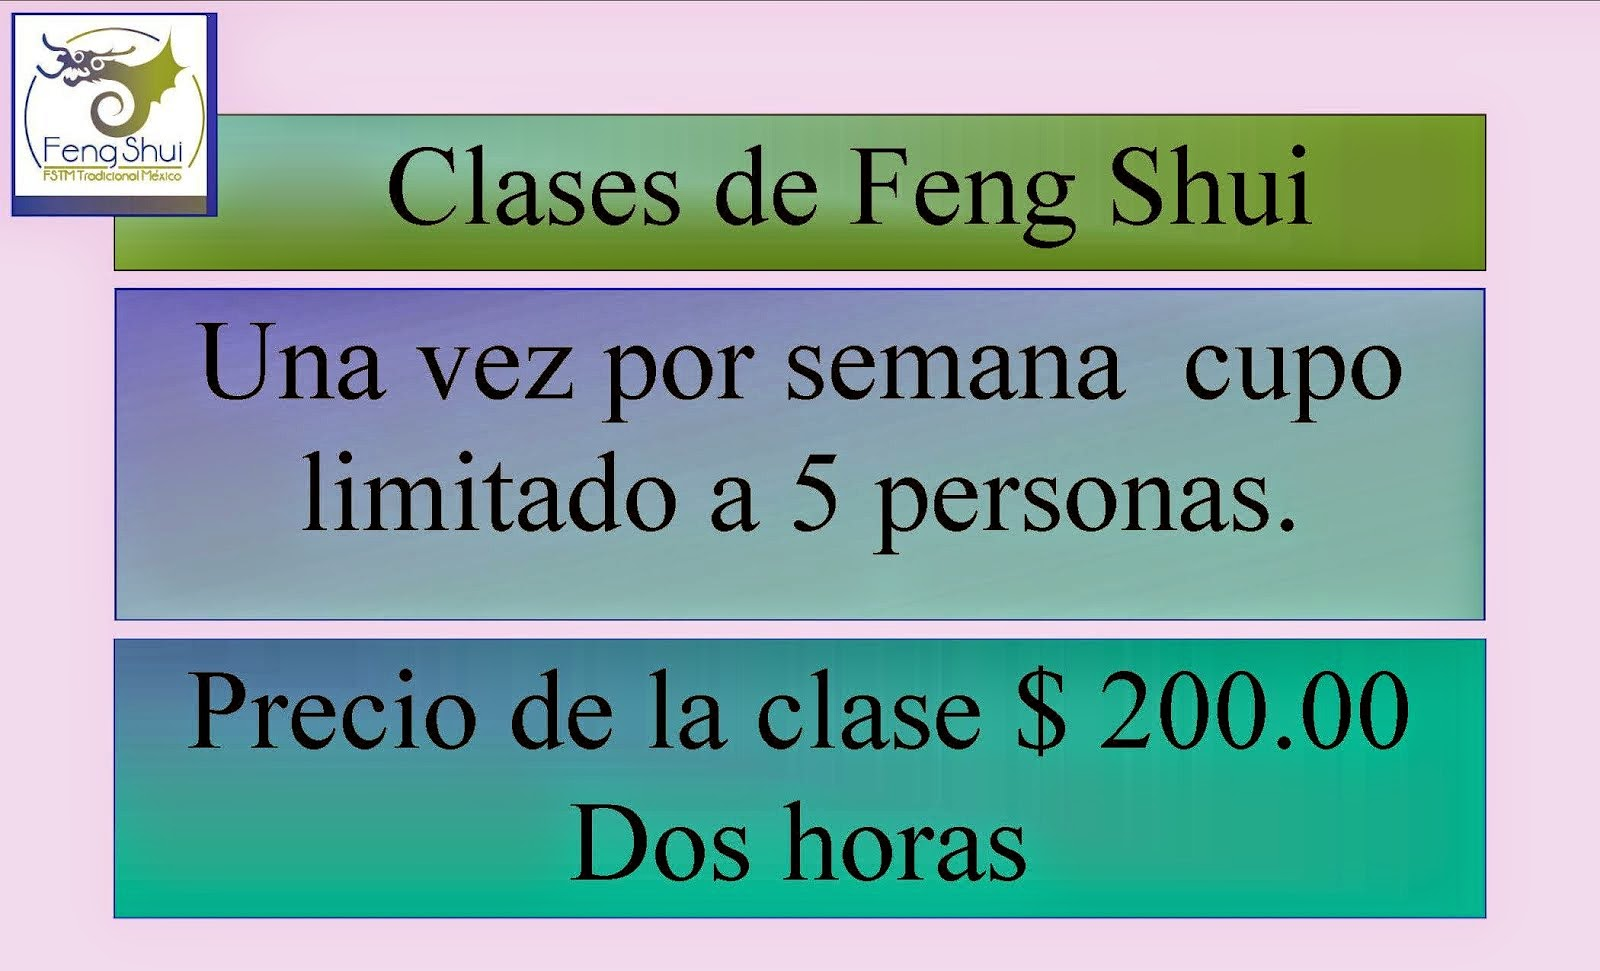 curso profesional de feng shui curso de feng shui online. Black Bedroom Furniture Sets. Home Design Ideas